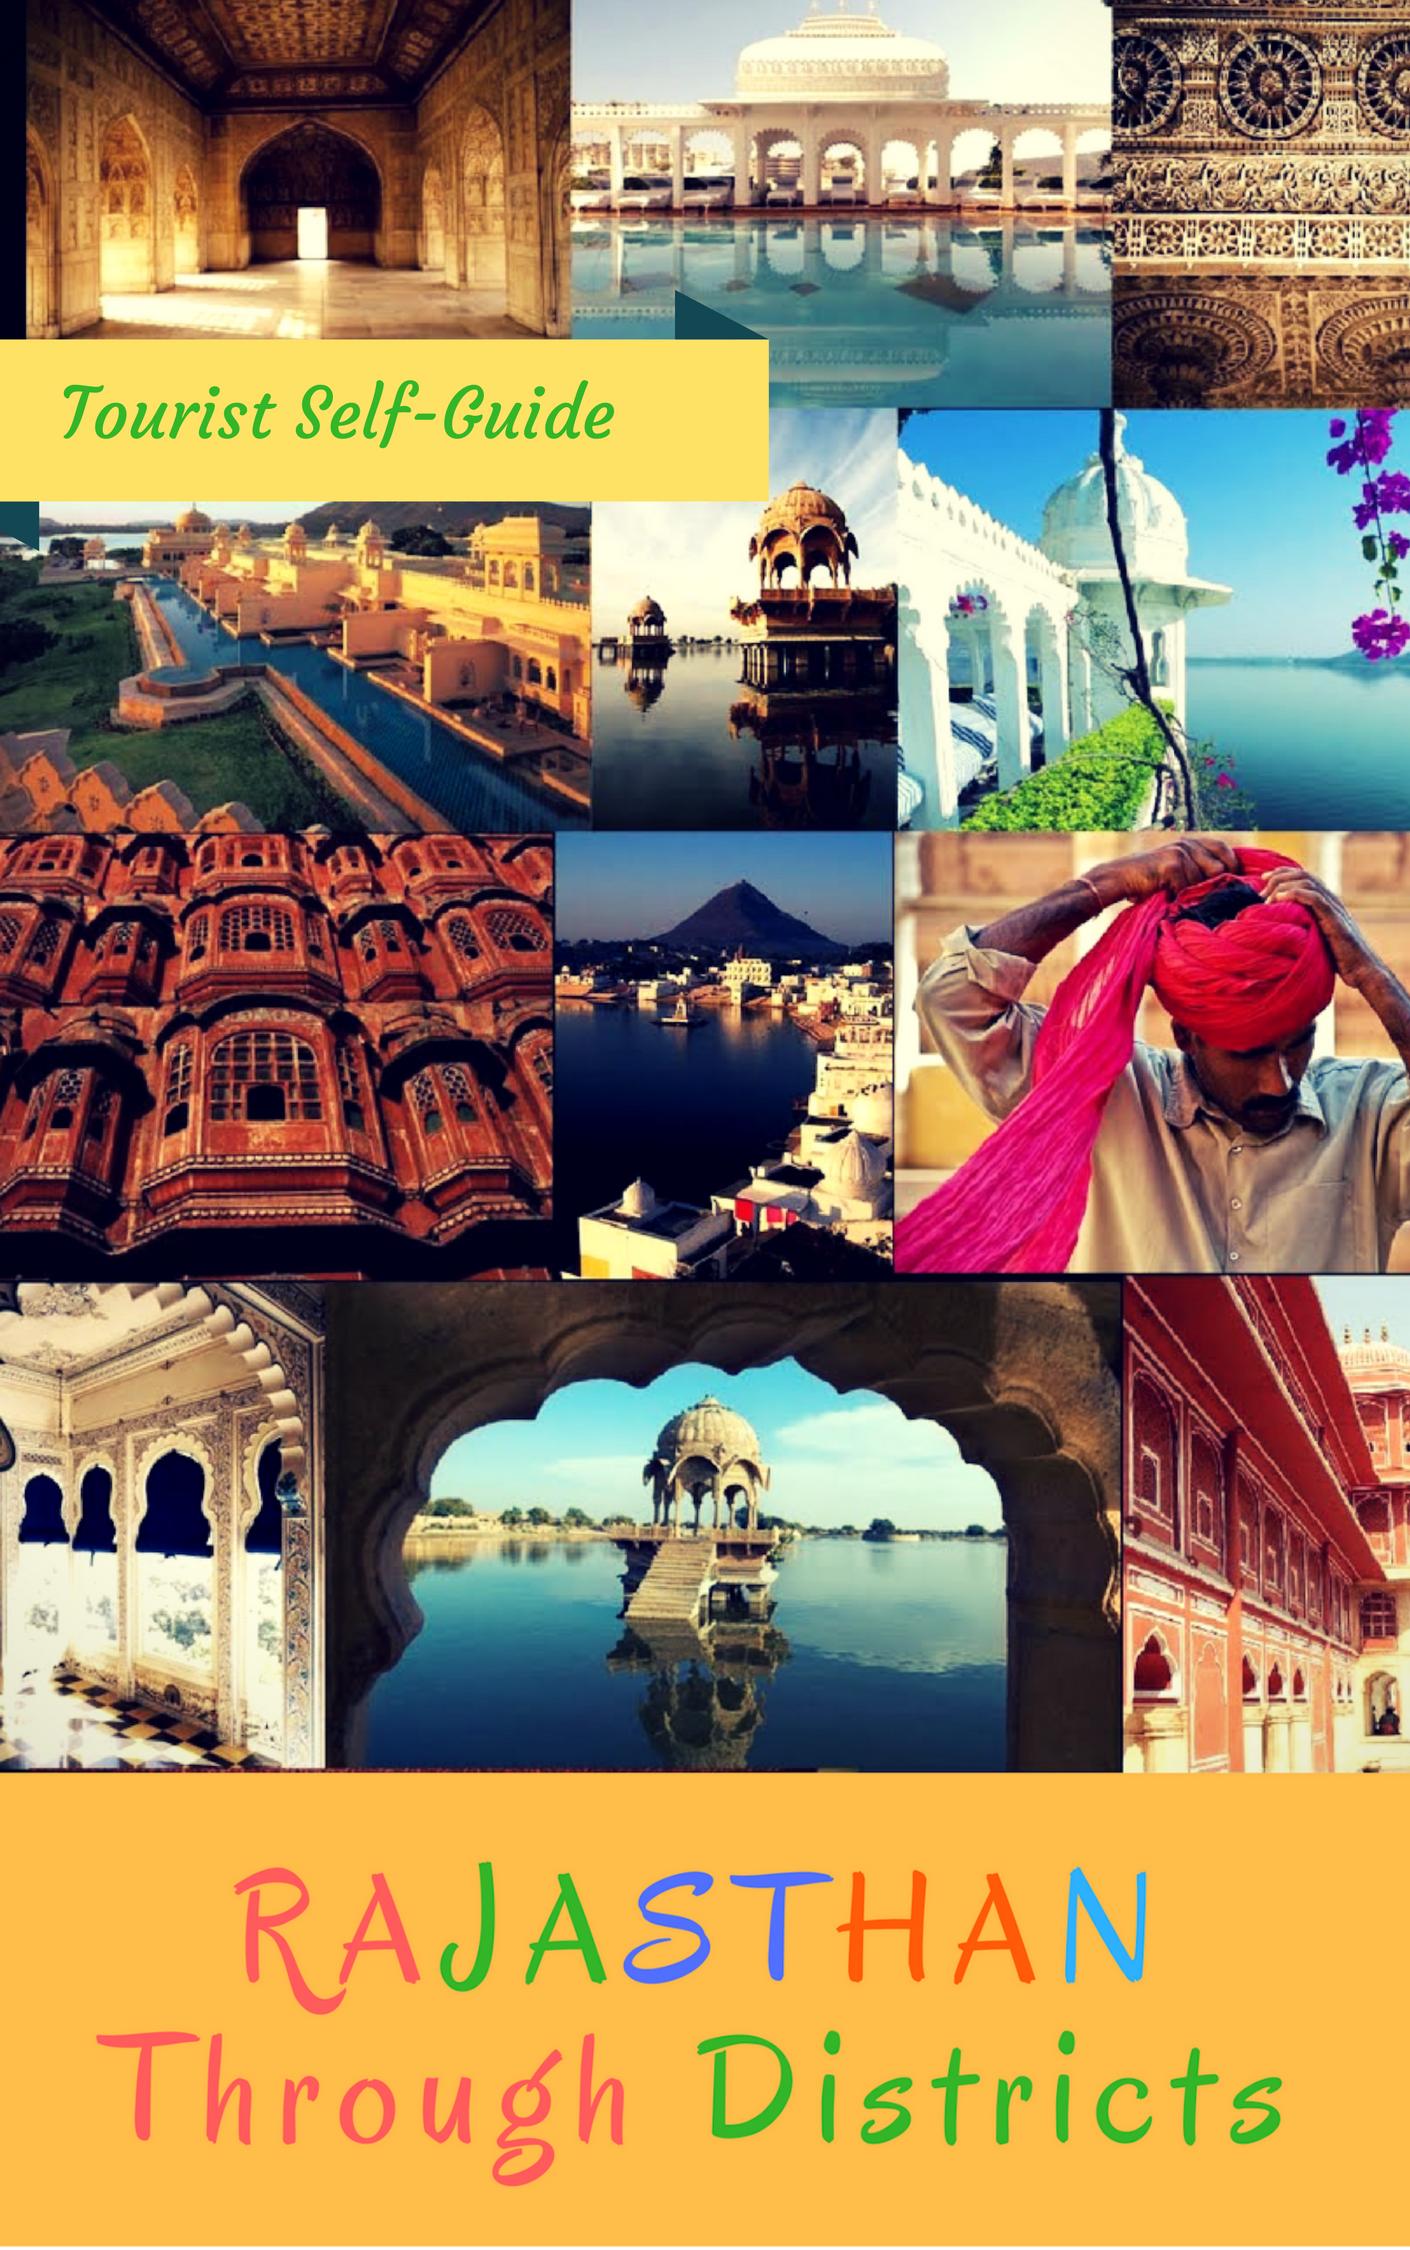 Rajasthan Travel Guide PDF: Tourist Self-Guide